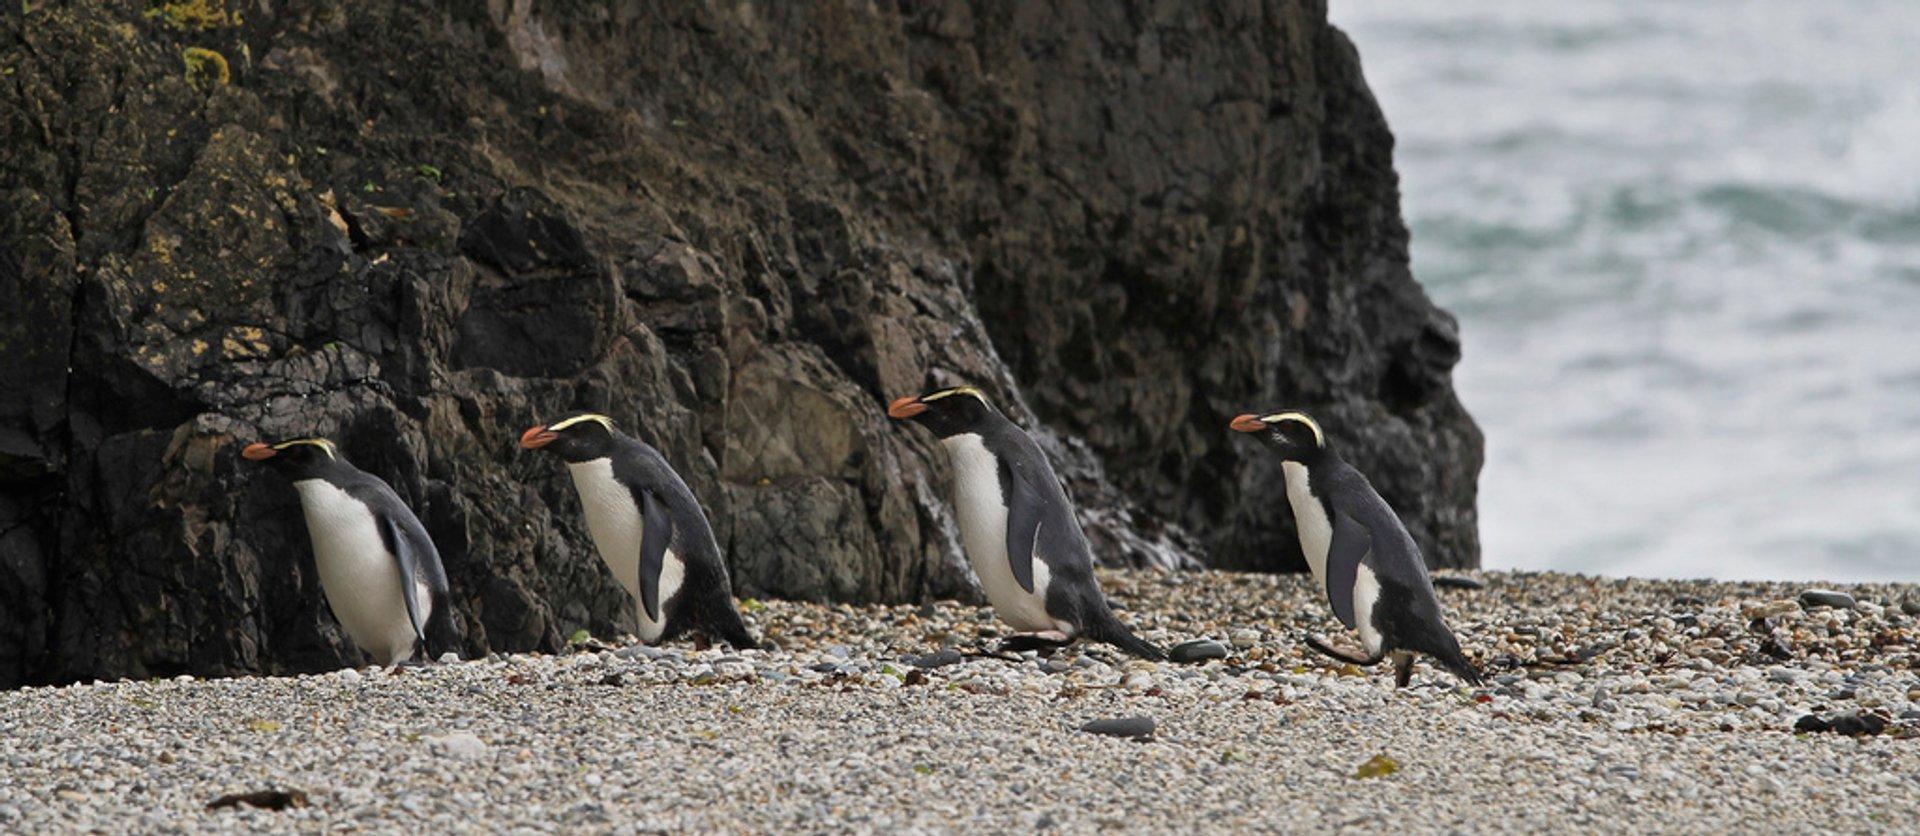 West coast, South Island, Tawaki Penguins head for the rainforest. 2020